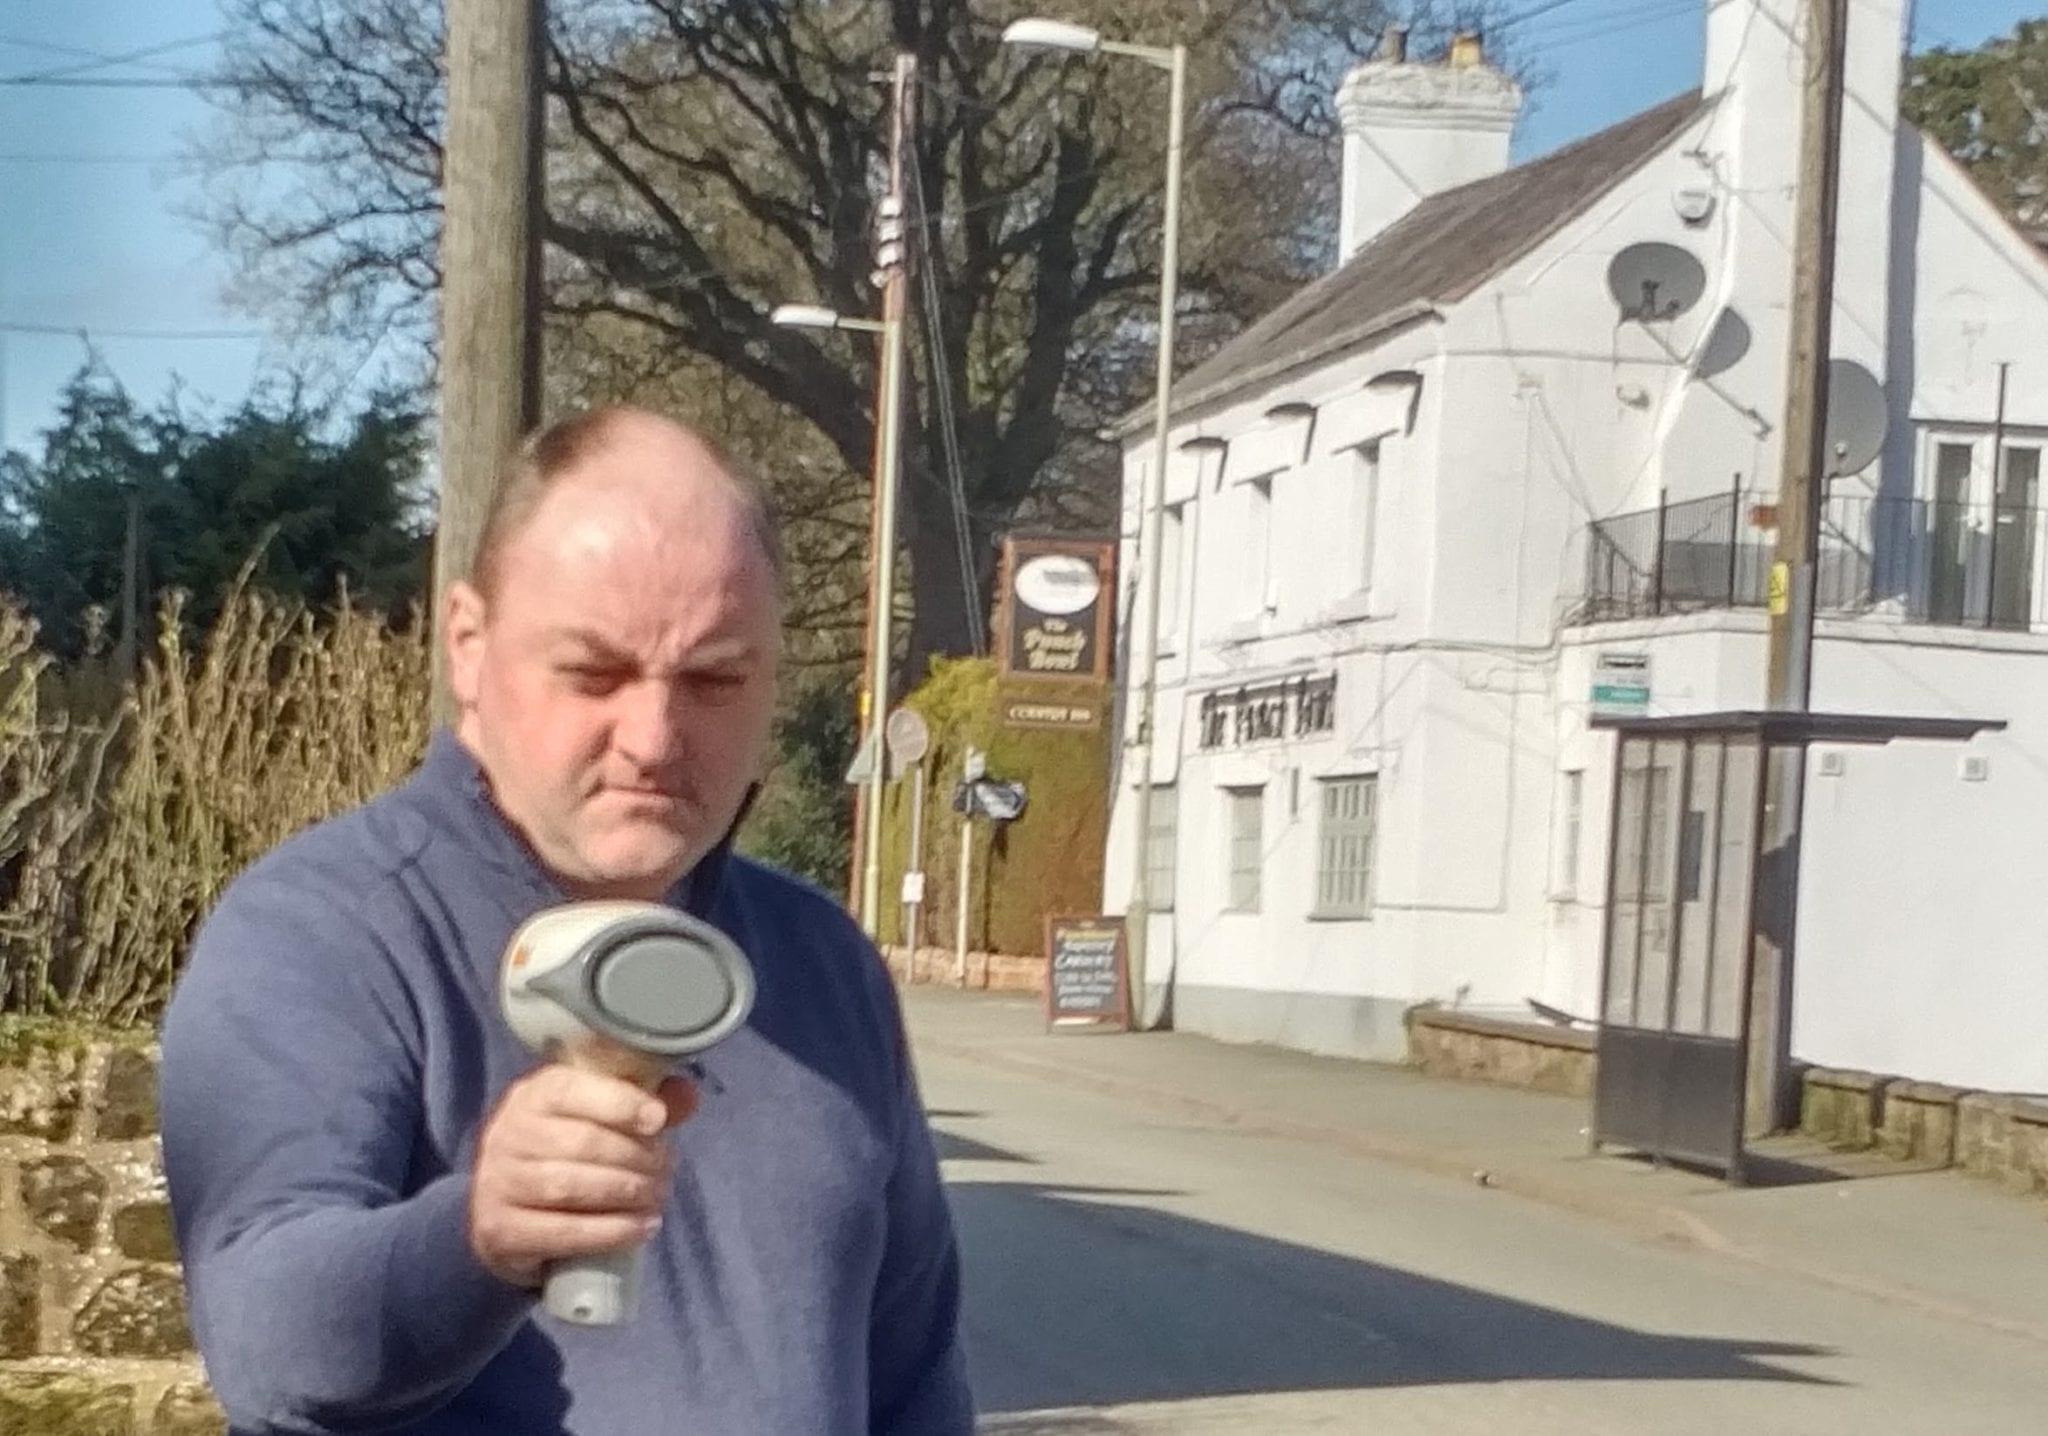 David Walker measuring traffic speed in Whittington and West Felton